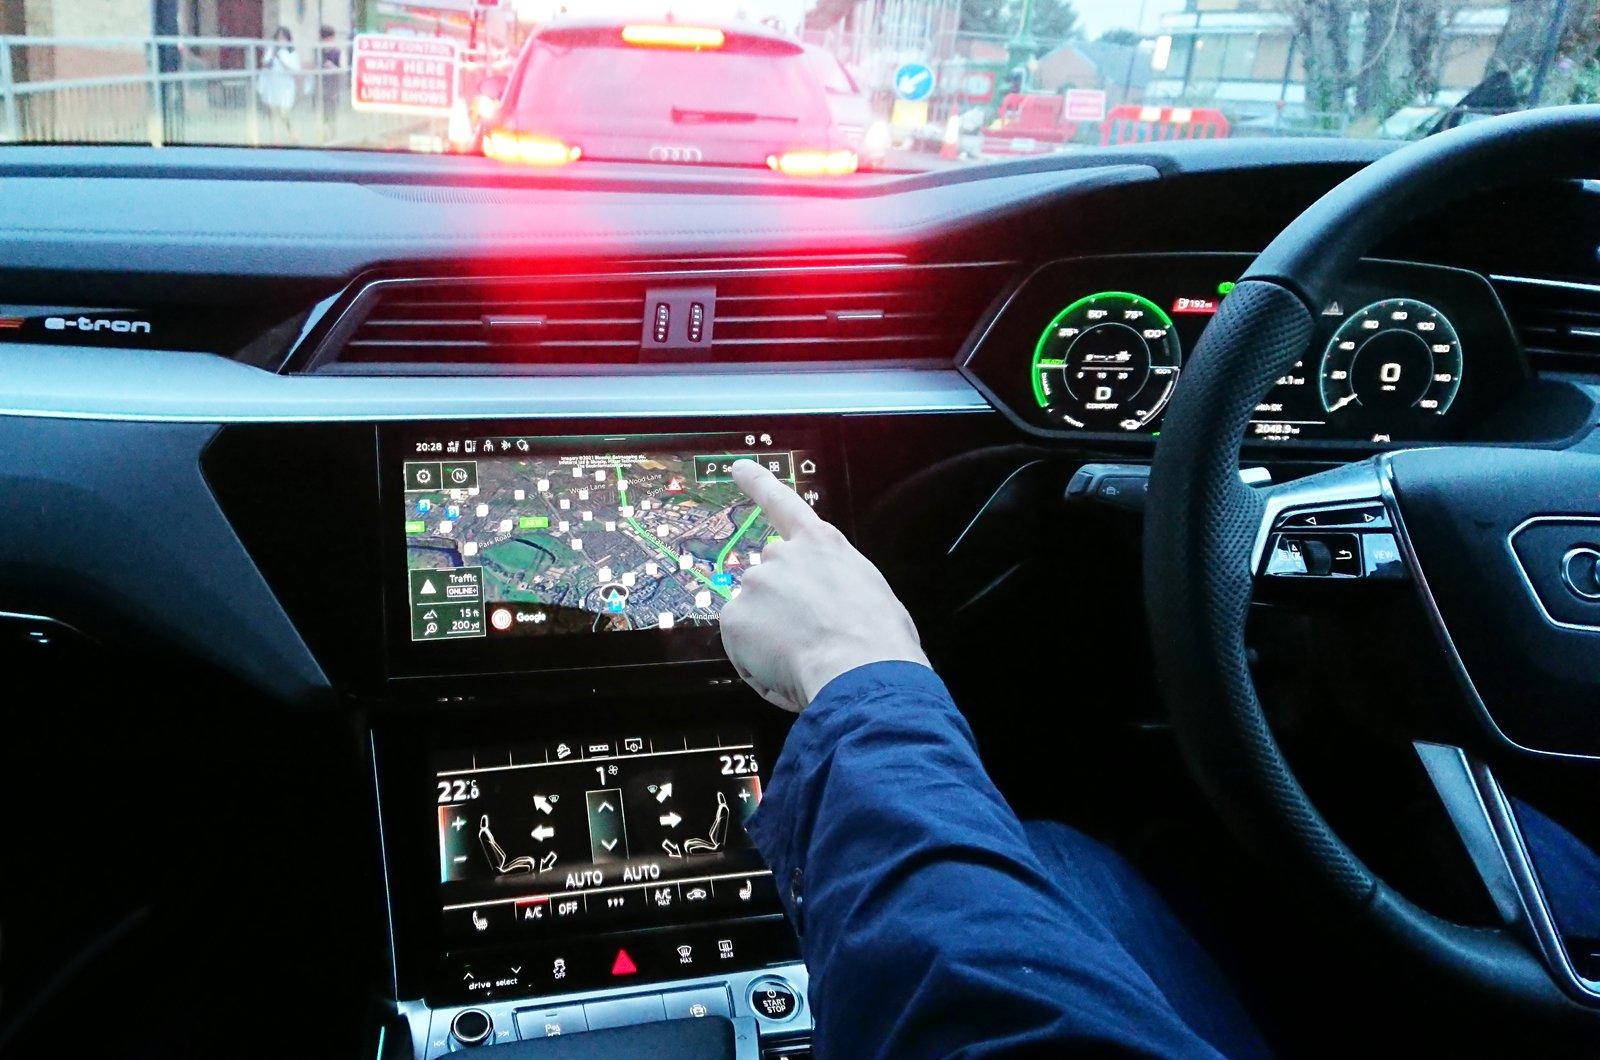 LT Audi E-tron Sportback - using touchscreen